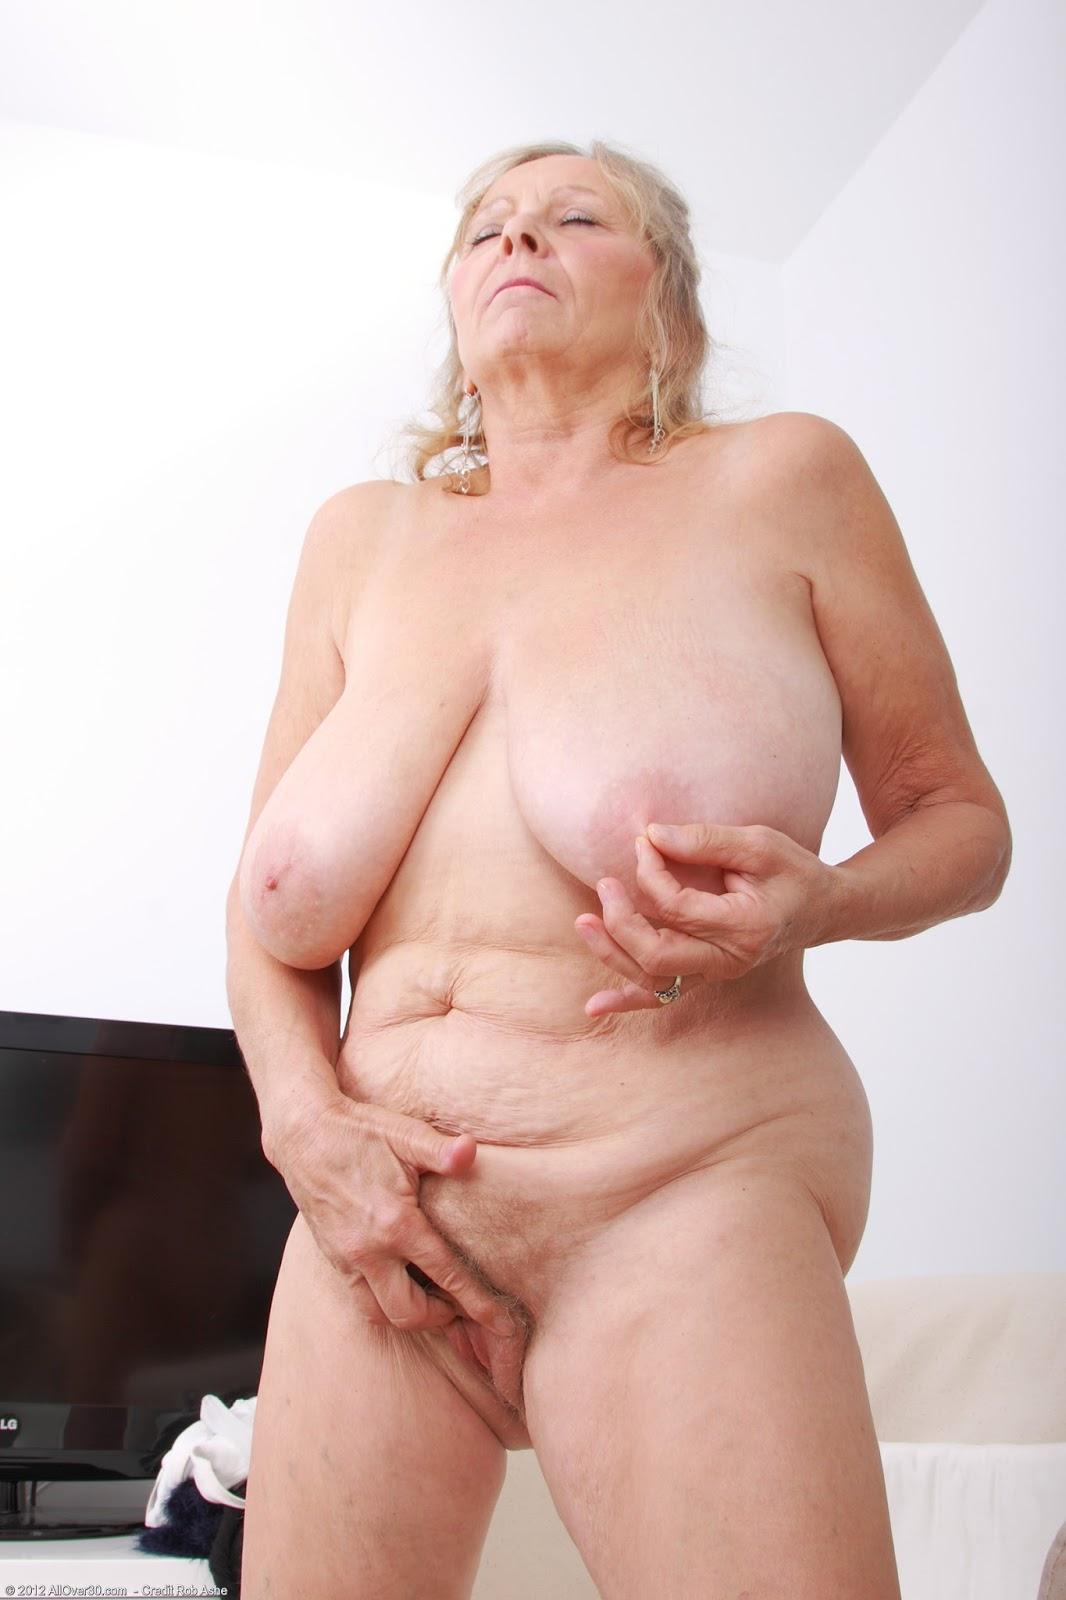 Megan nude pictures-8429